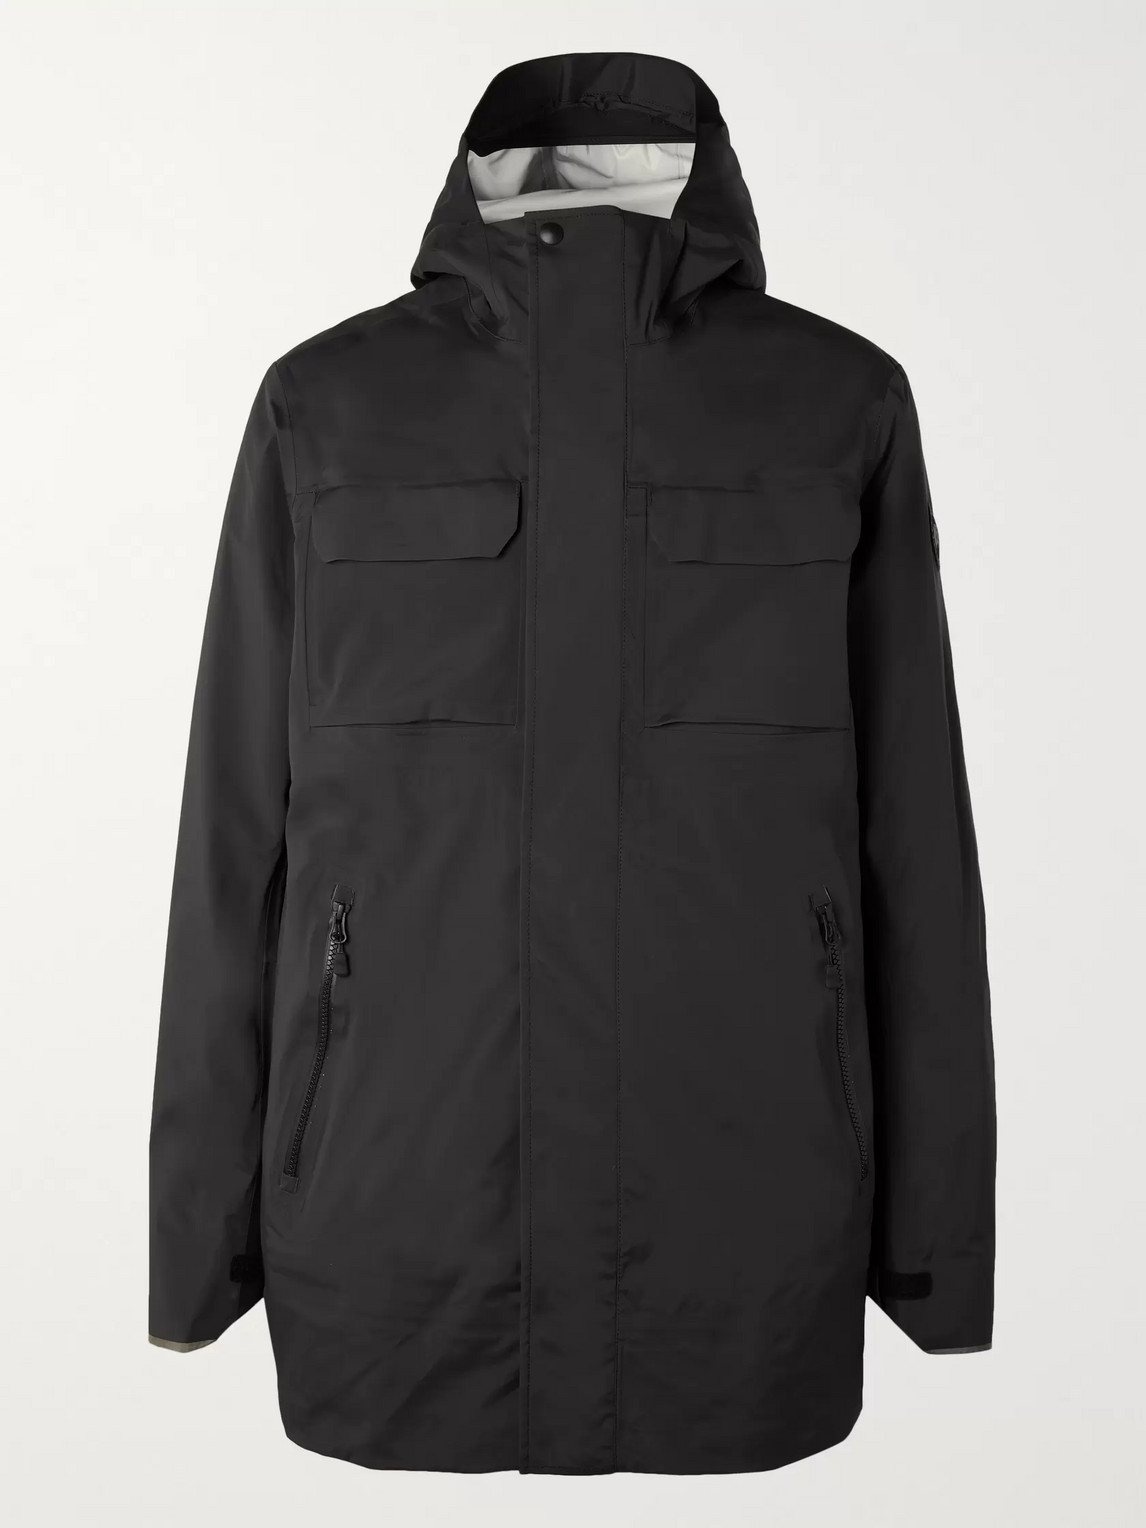 canada goose - wascana tri-durance hooded jacket - men - black